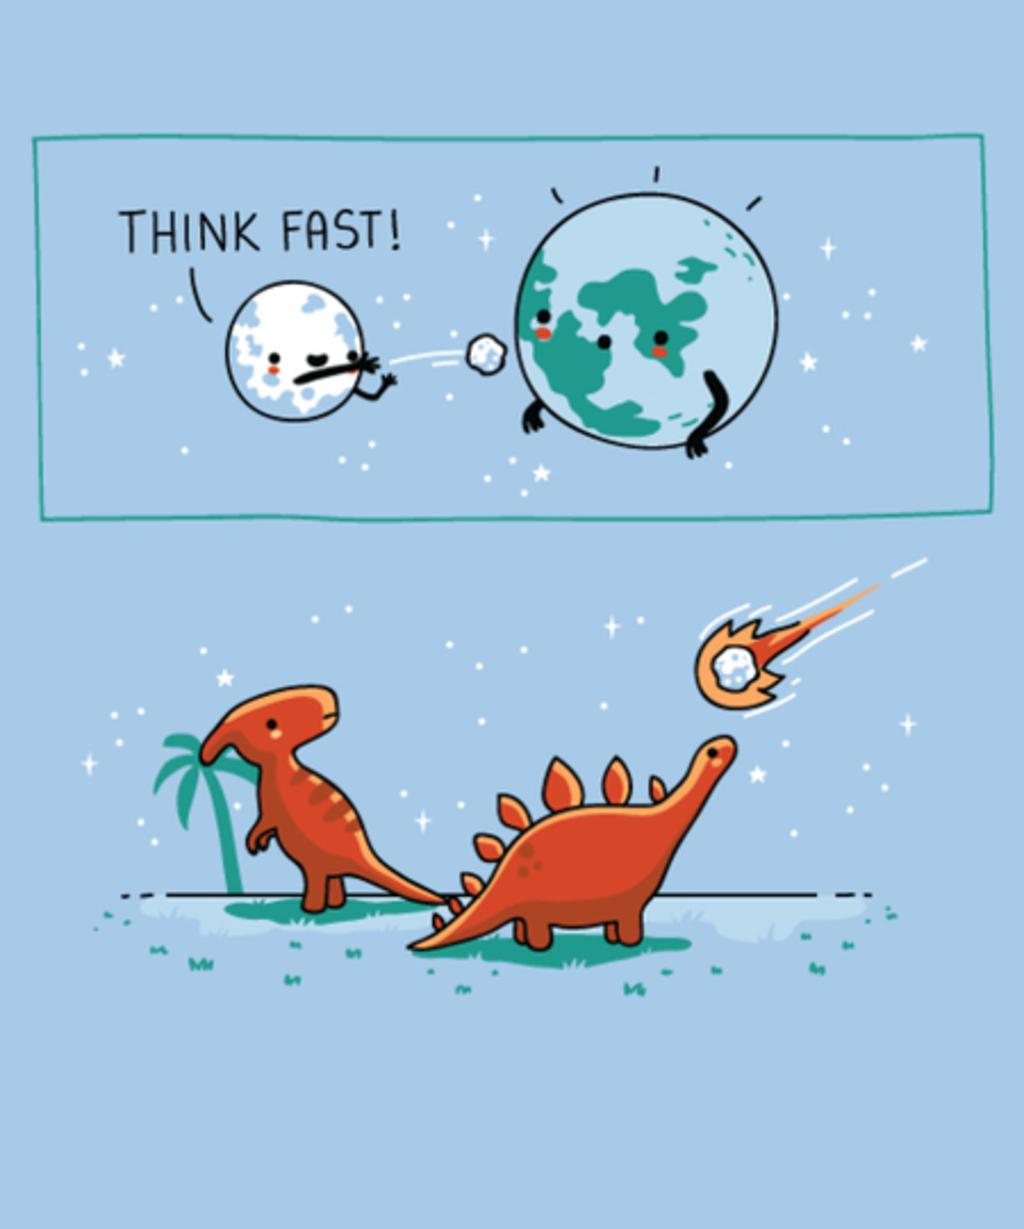 Qwertee: Think Fast